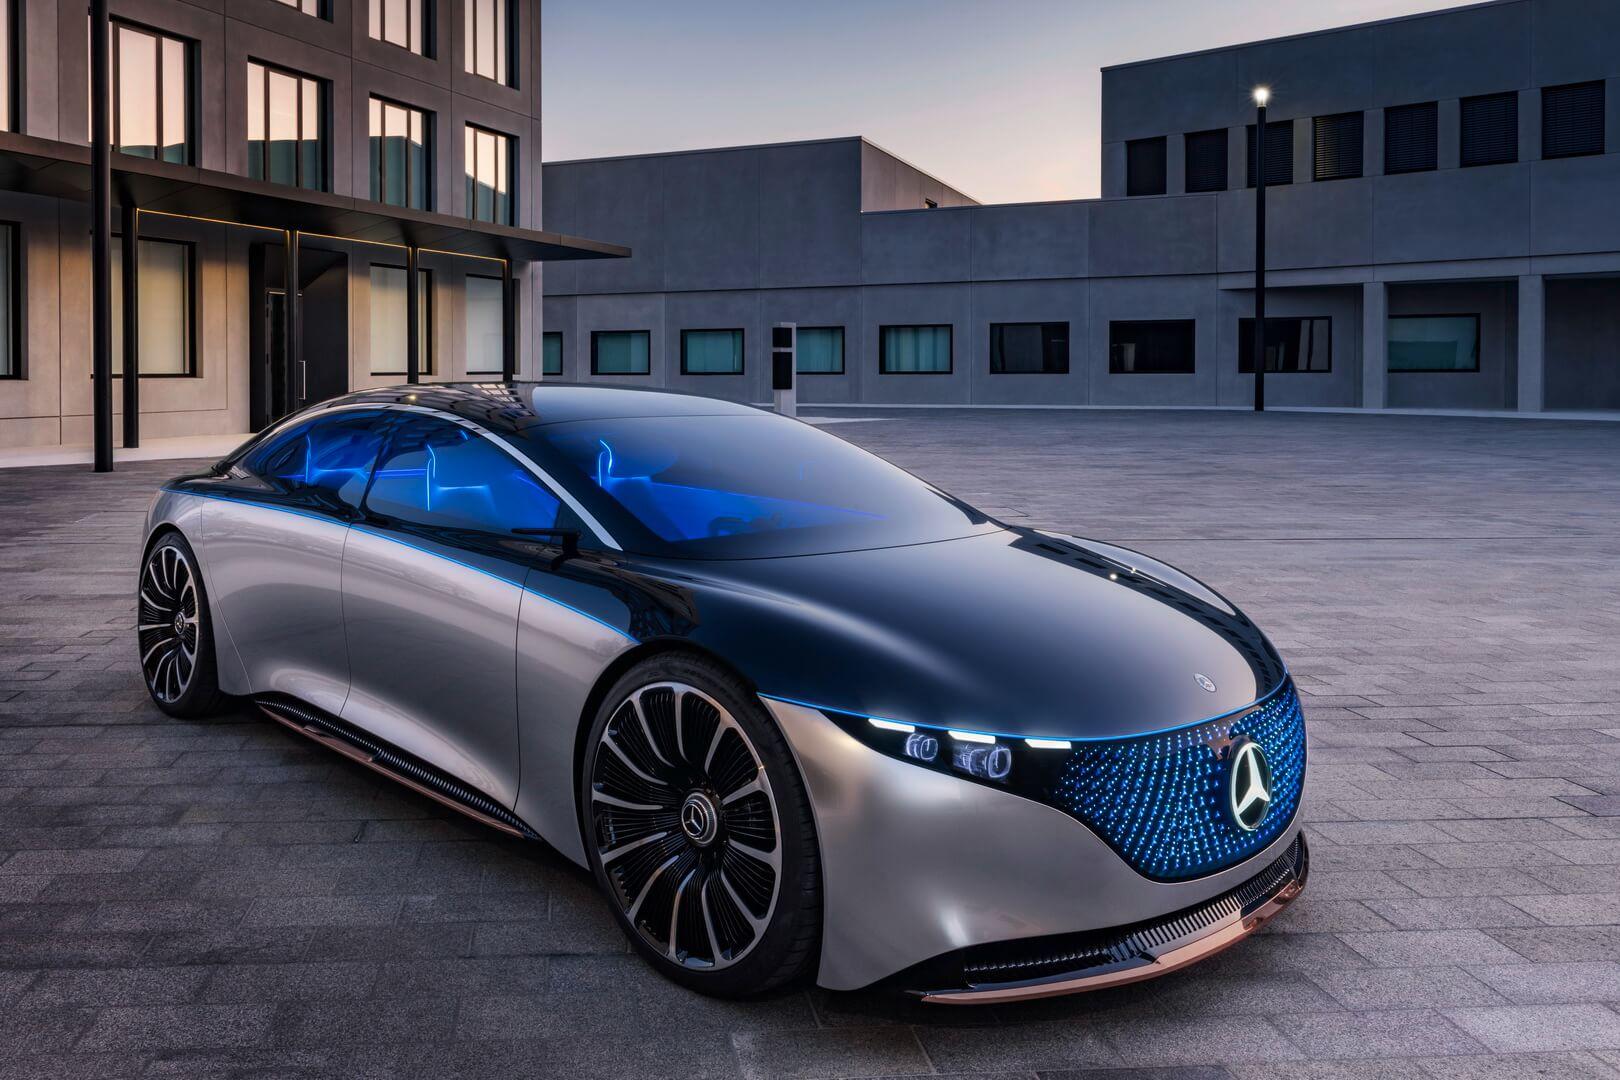 Концепт электрического седана Mercedes-Benz VISION EQS